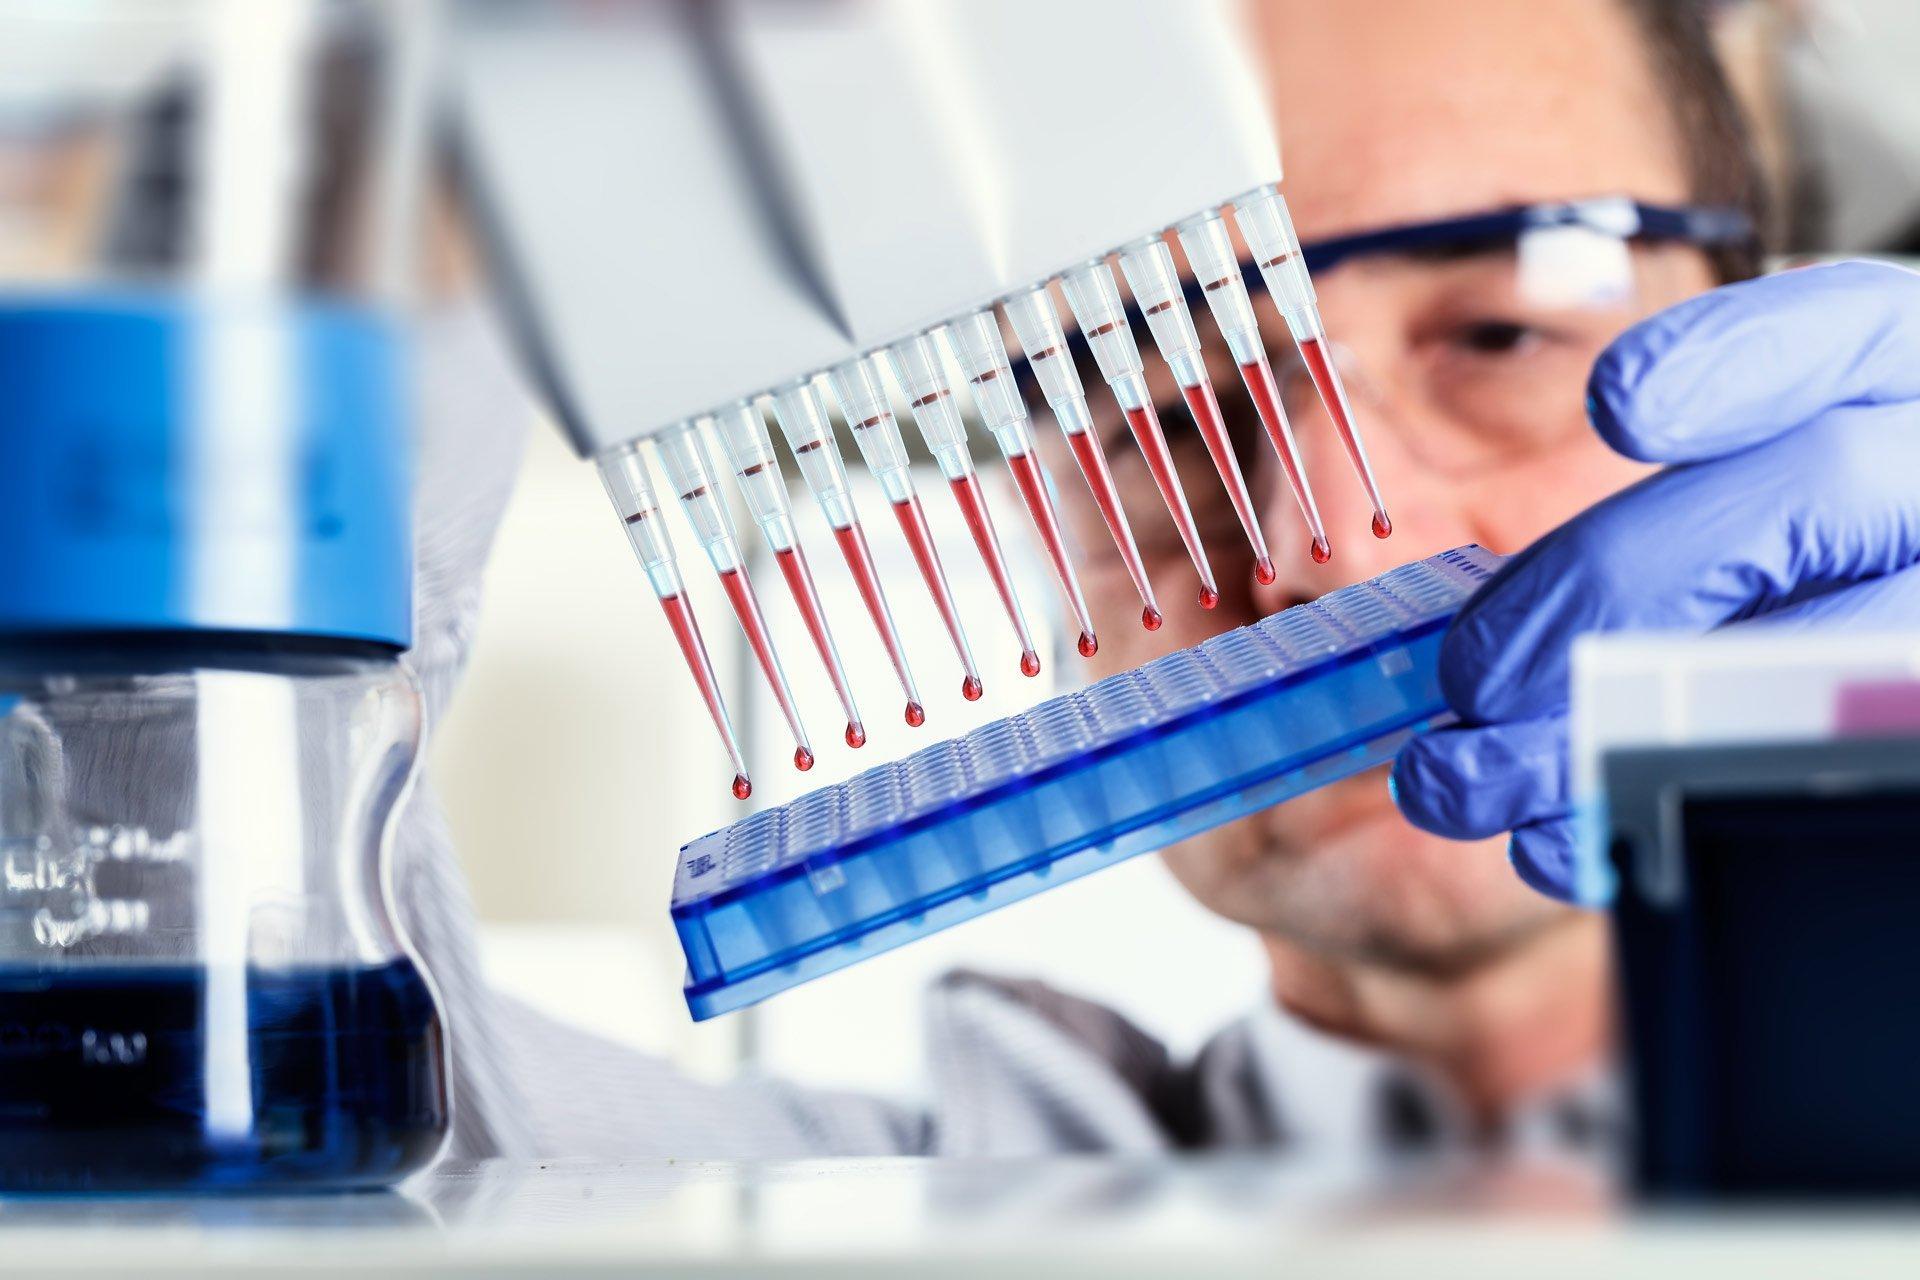 Анализ крови на описторхоз подготовка процедура расшифровка и лечение паразитарного заболевания